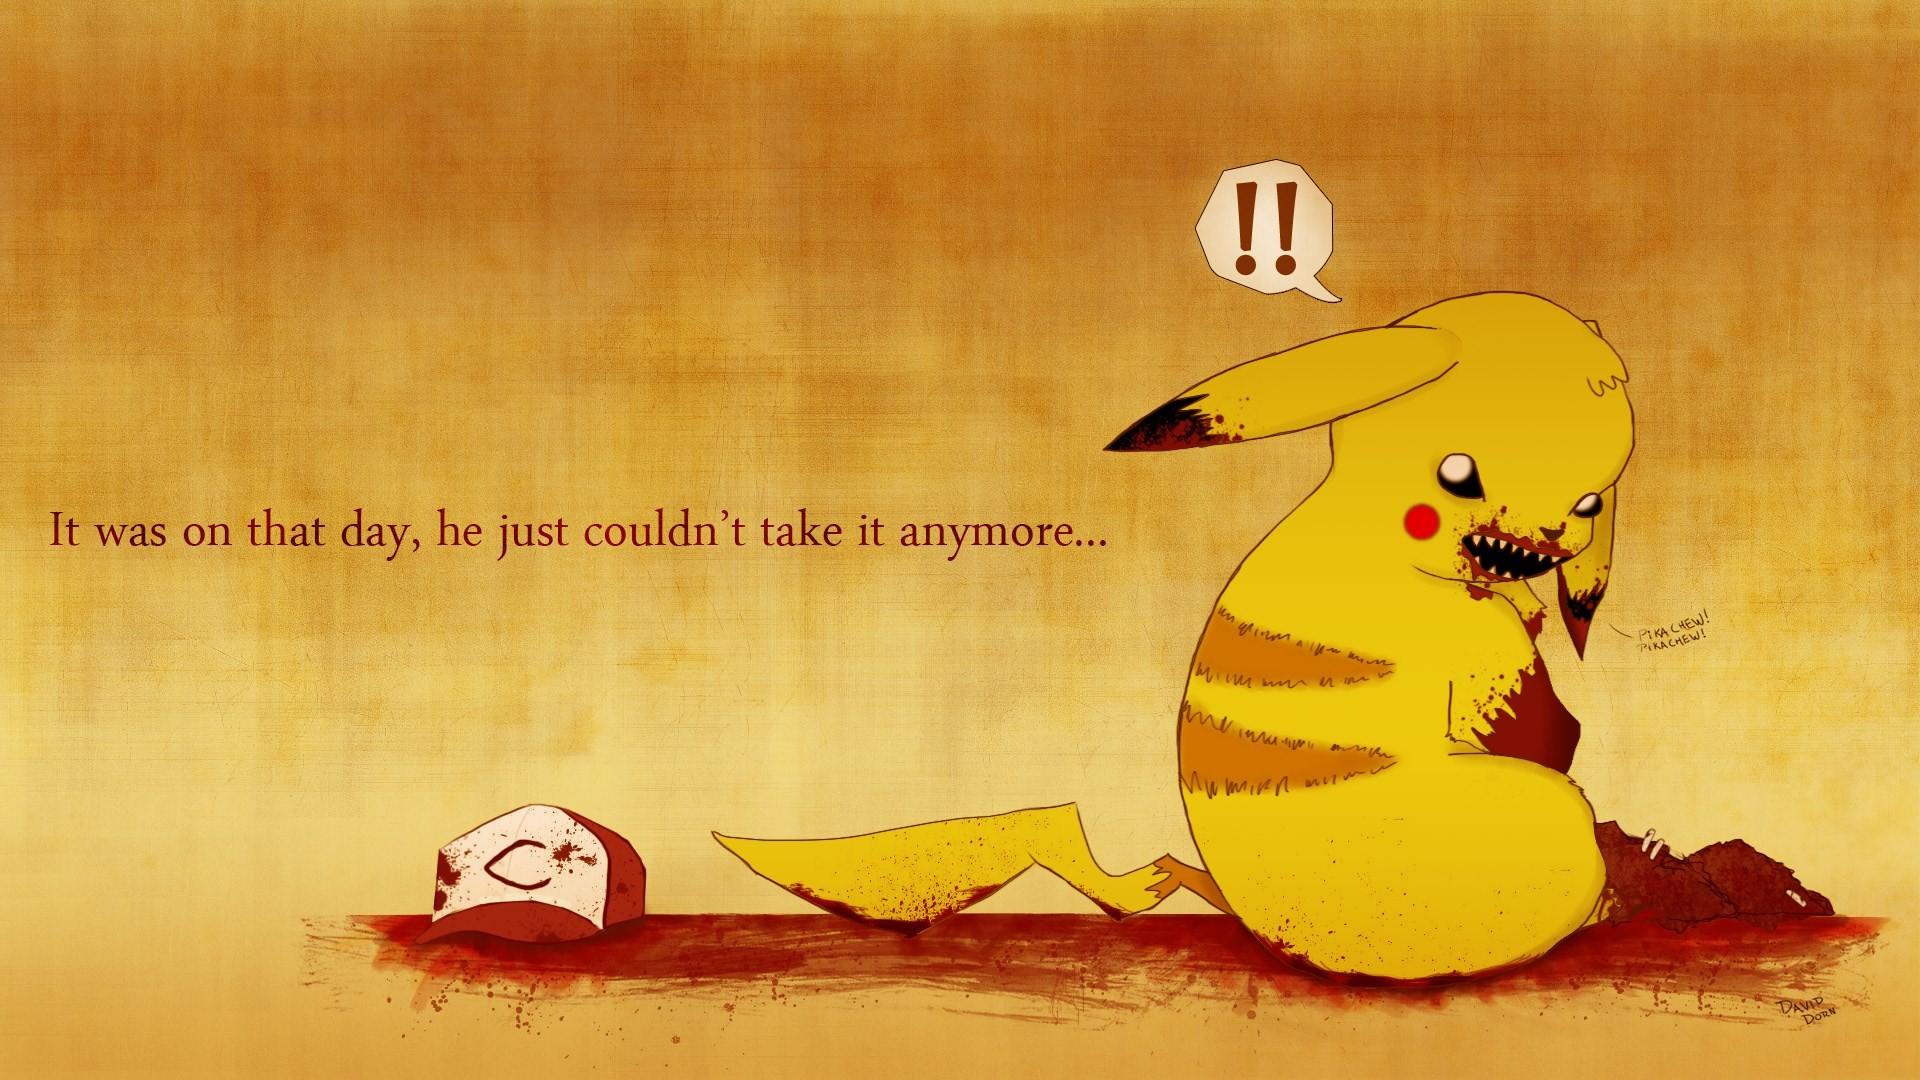 pikachu desktop wallpaper pictures free